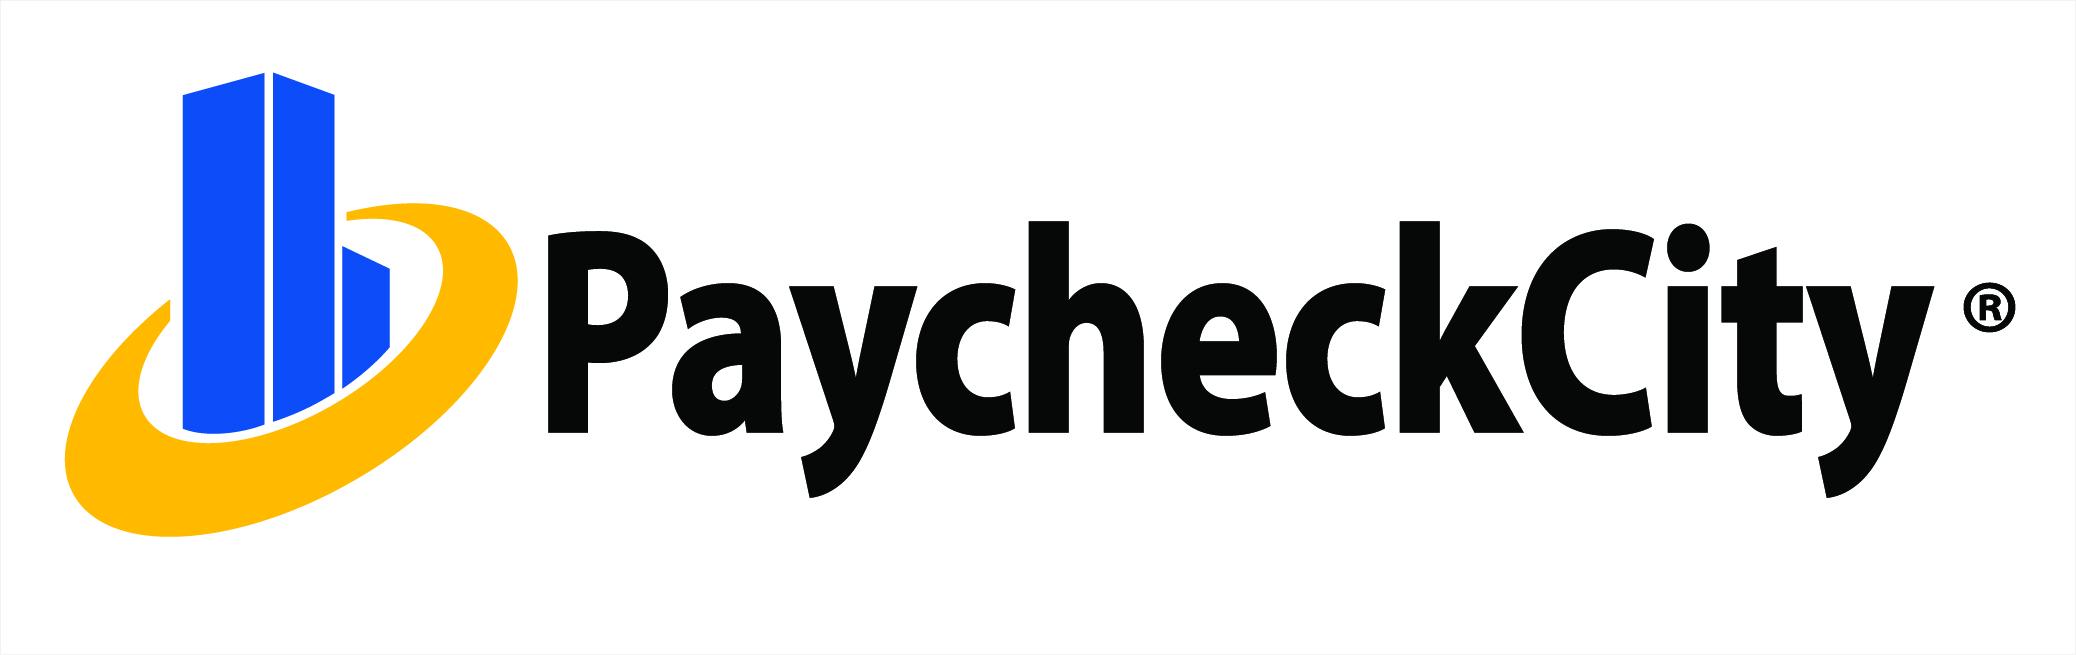 Paycheck City